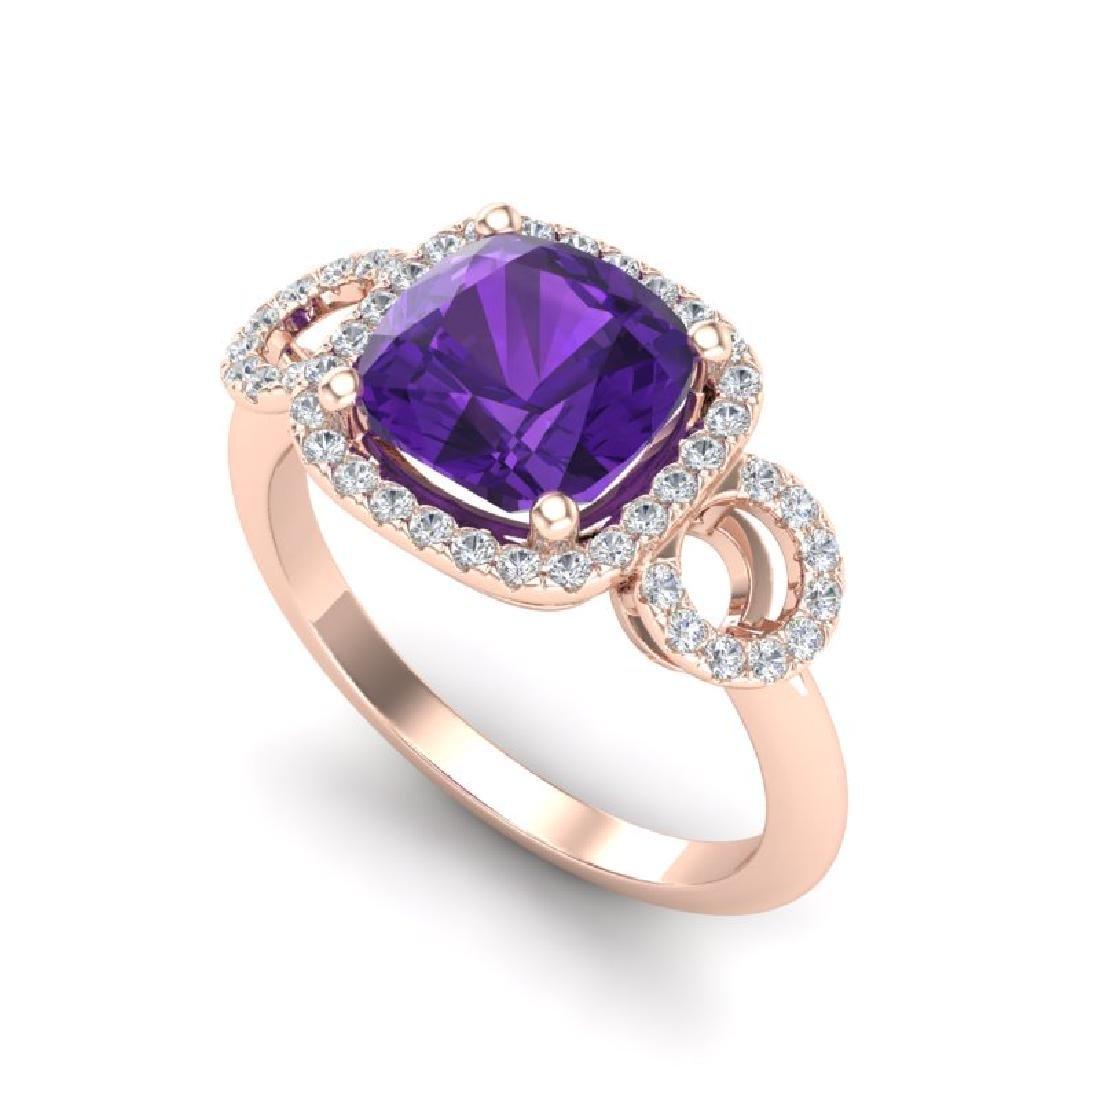 3.75 CTW Amethyst & Micro VS/SI Diamond Ring 14K Rose - 2